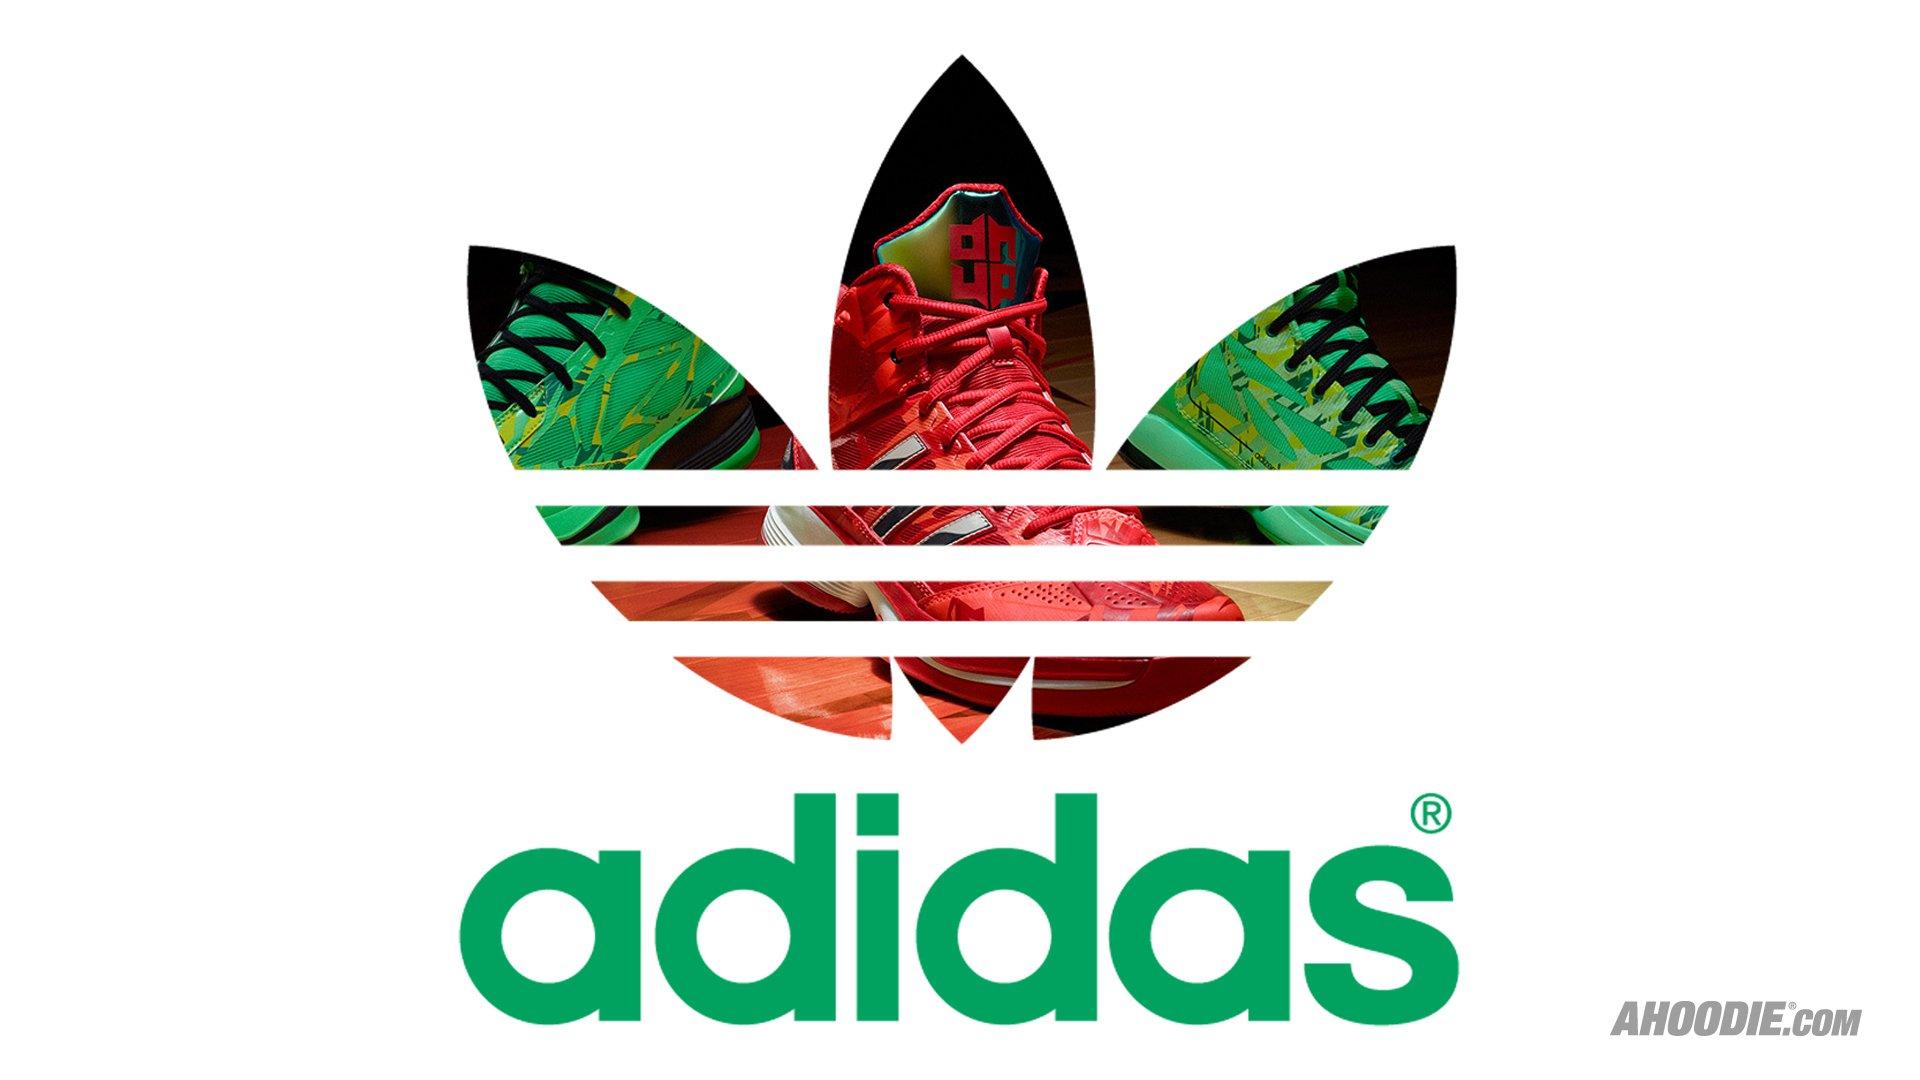 Logo Adidas 823027 - Adidas, Transparent background PNG HD thumbnail